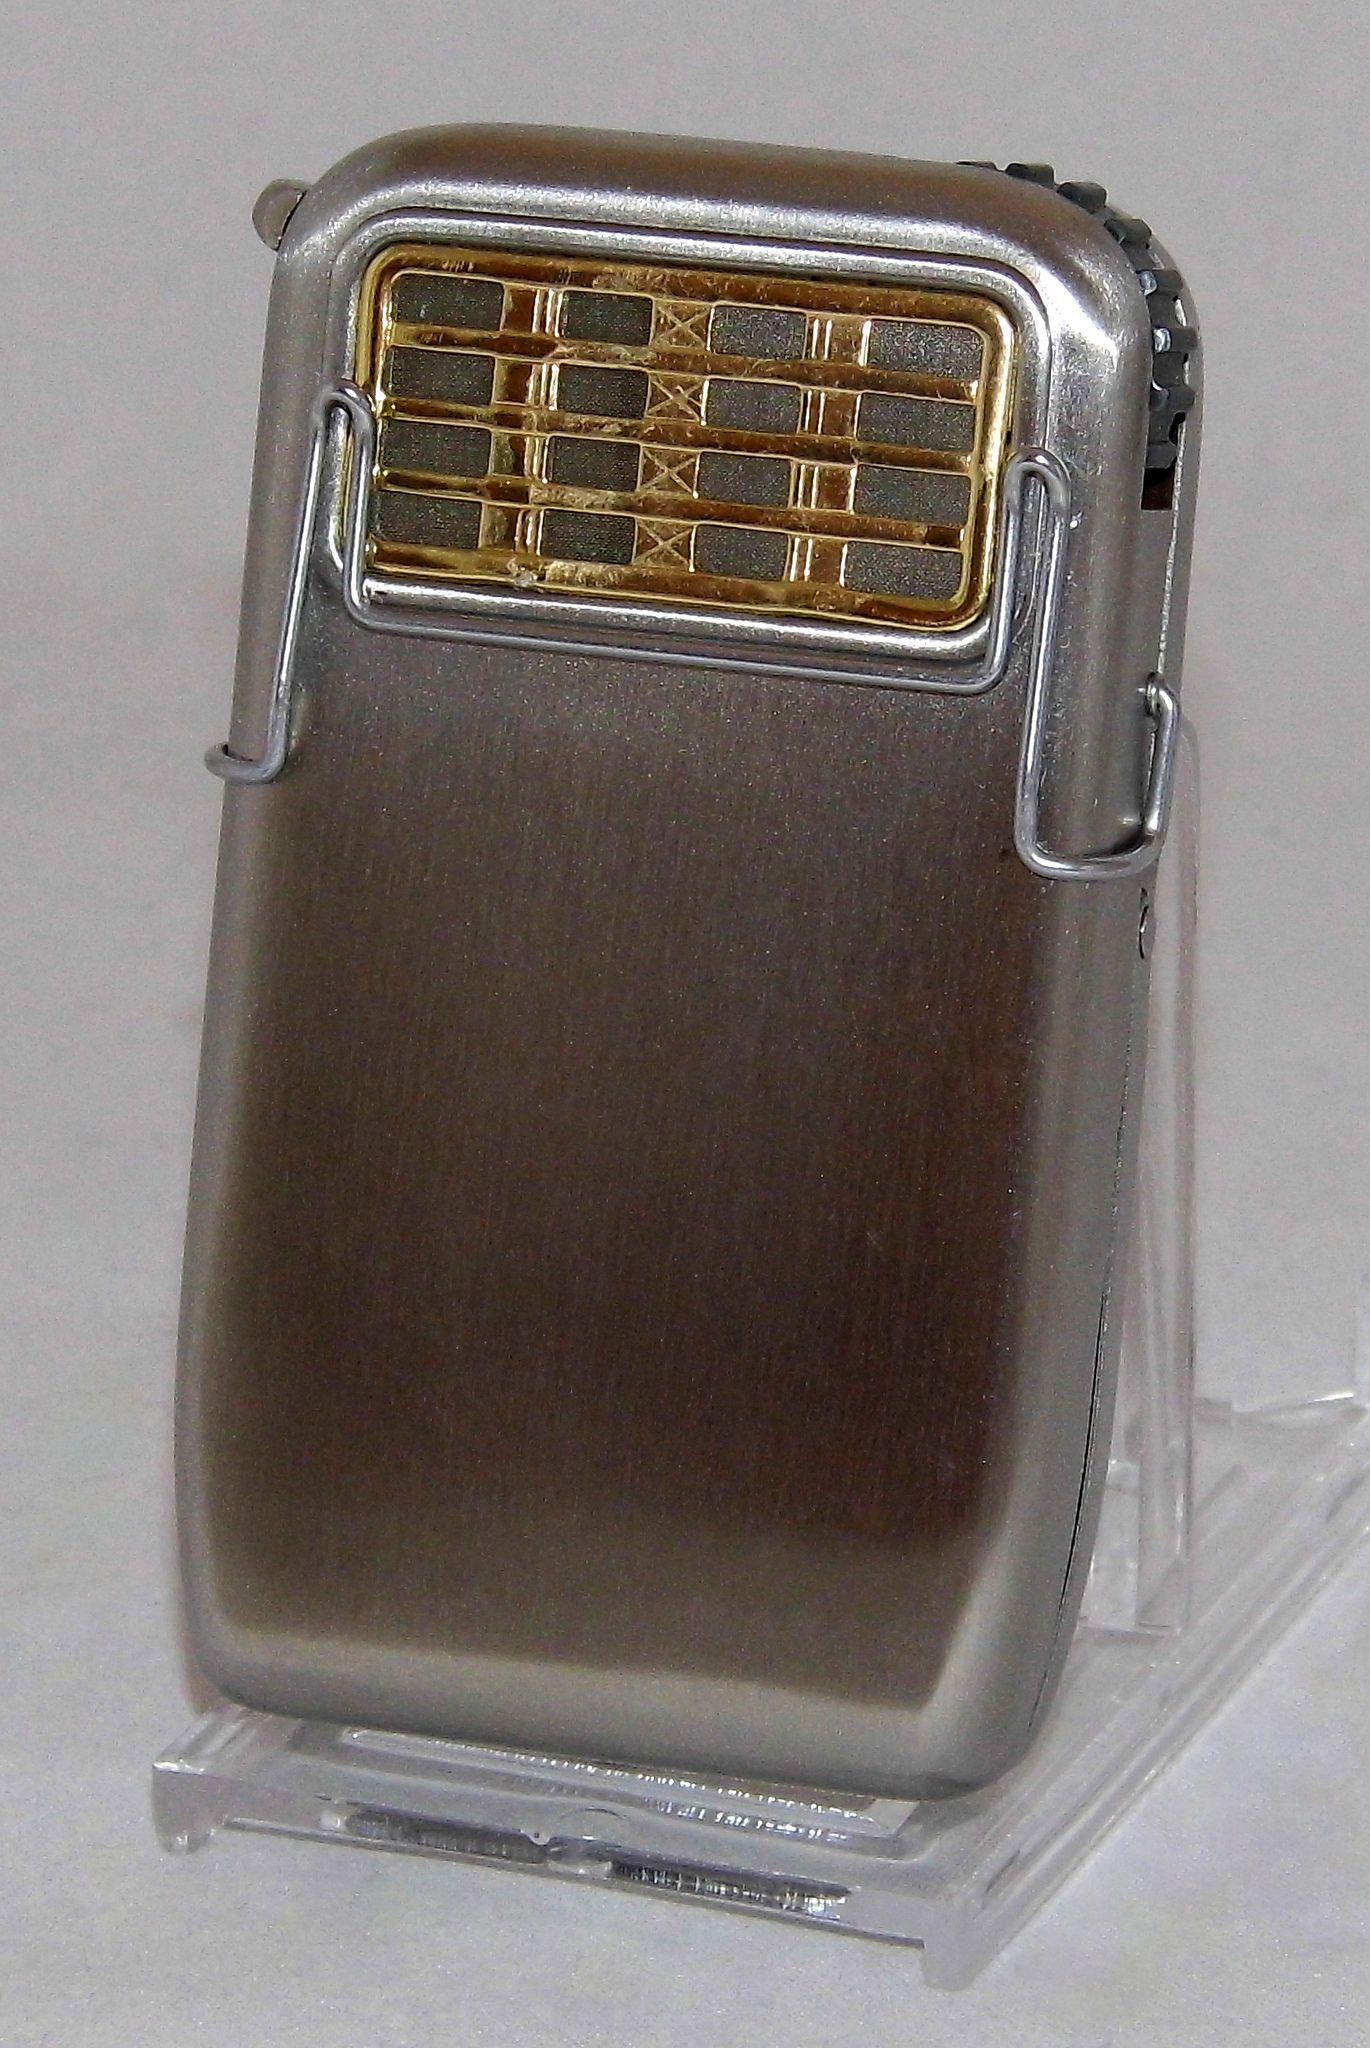 Vintage Sonotone Model 1010 Hybrid (2 Vacuum Tubes And 1